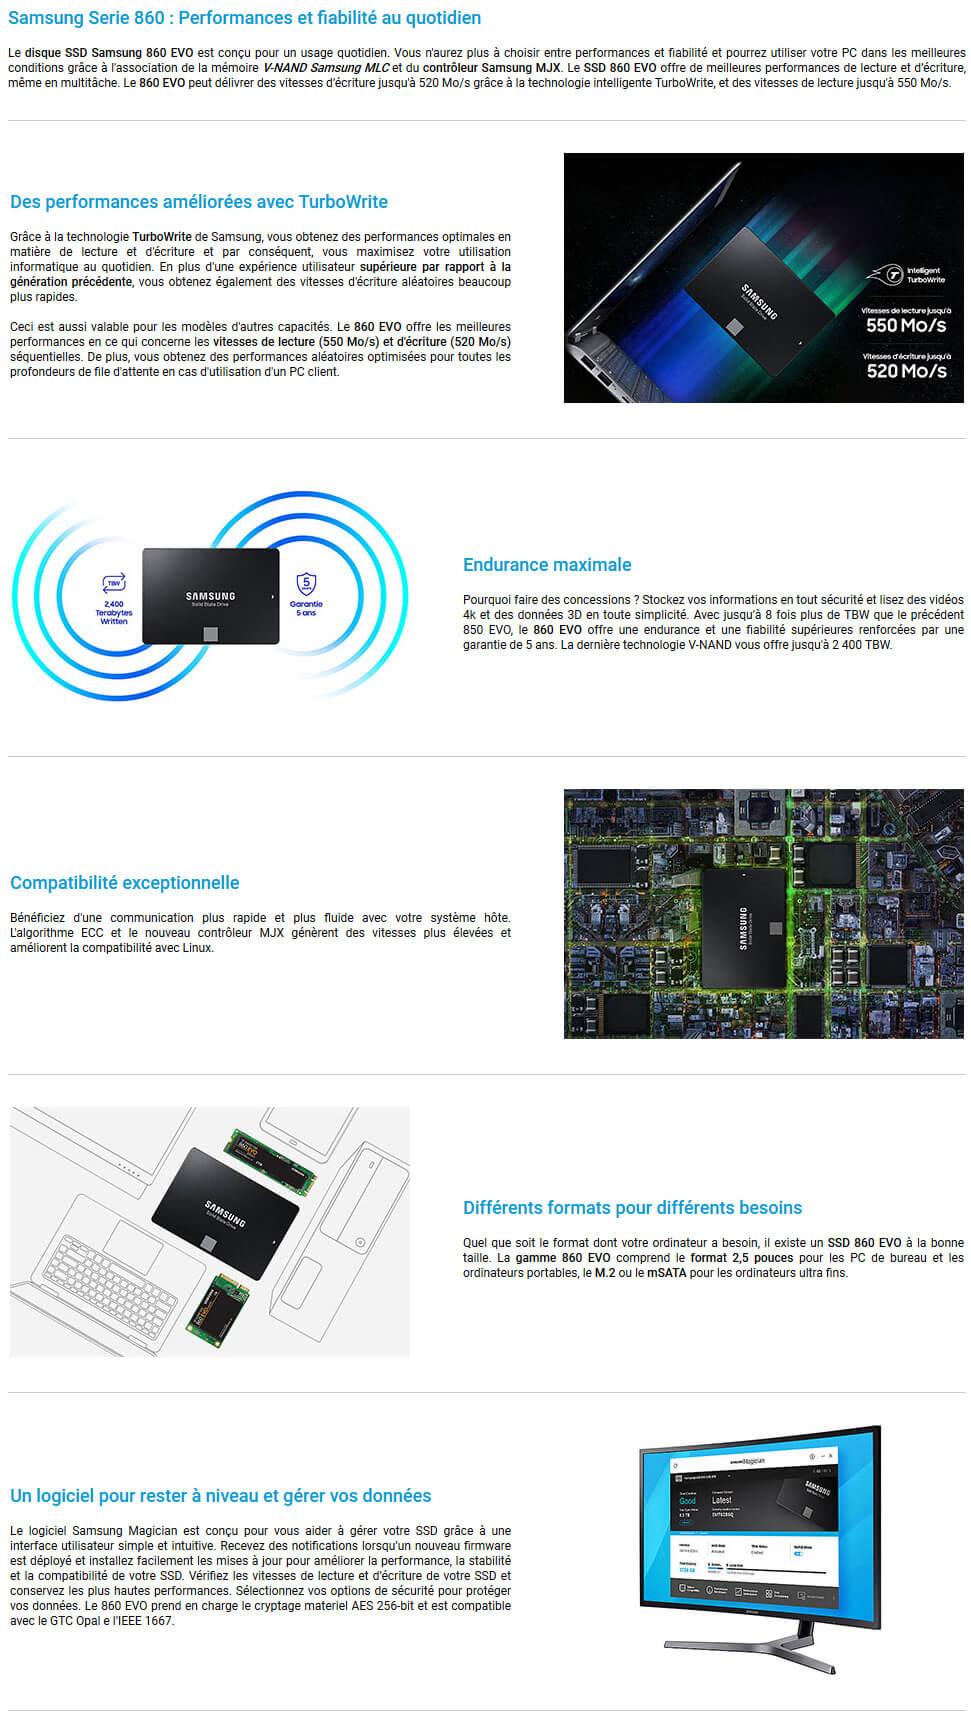 Samsung ssd 860 EVO SATA III 2.5 2 TB